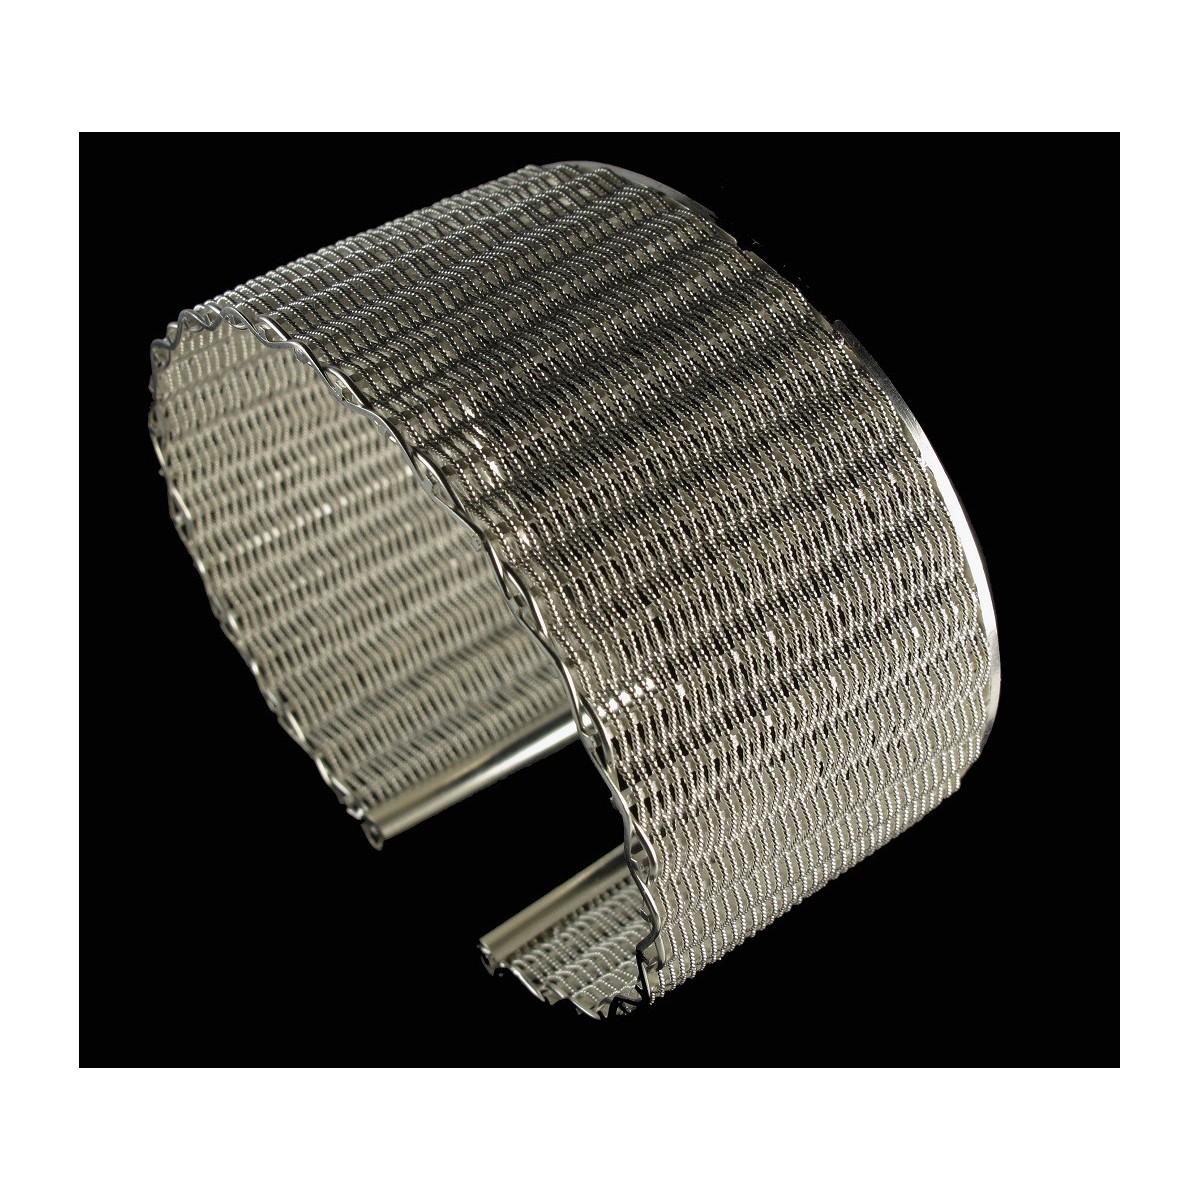 Bracciale argento filigrana